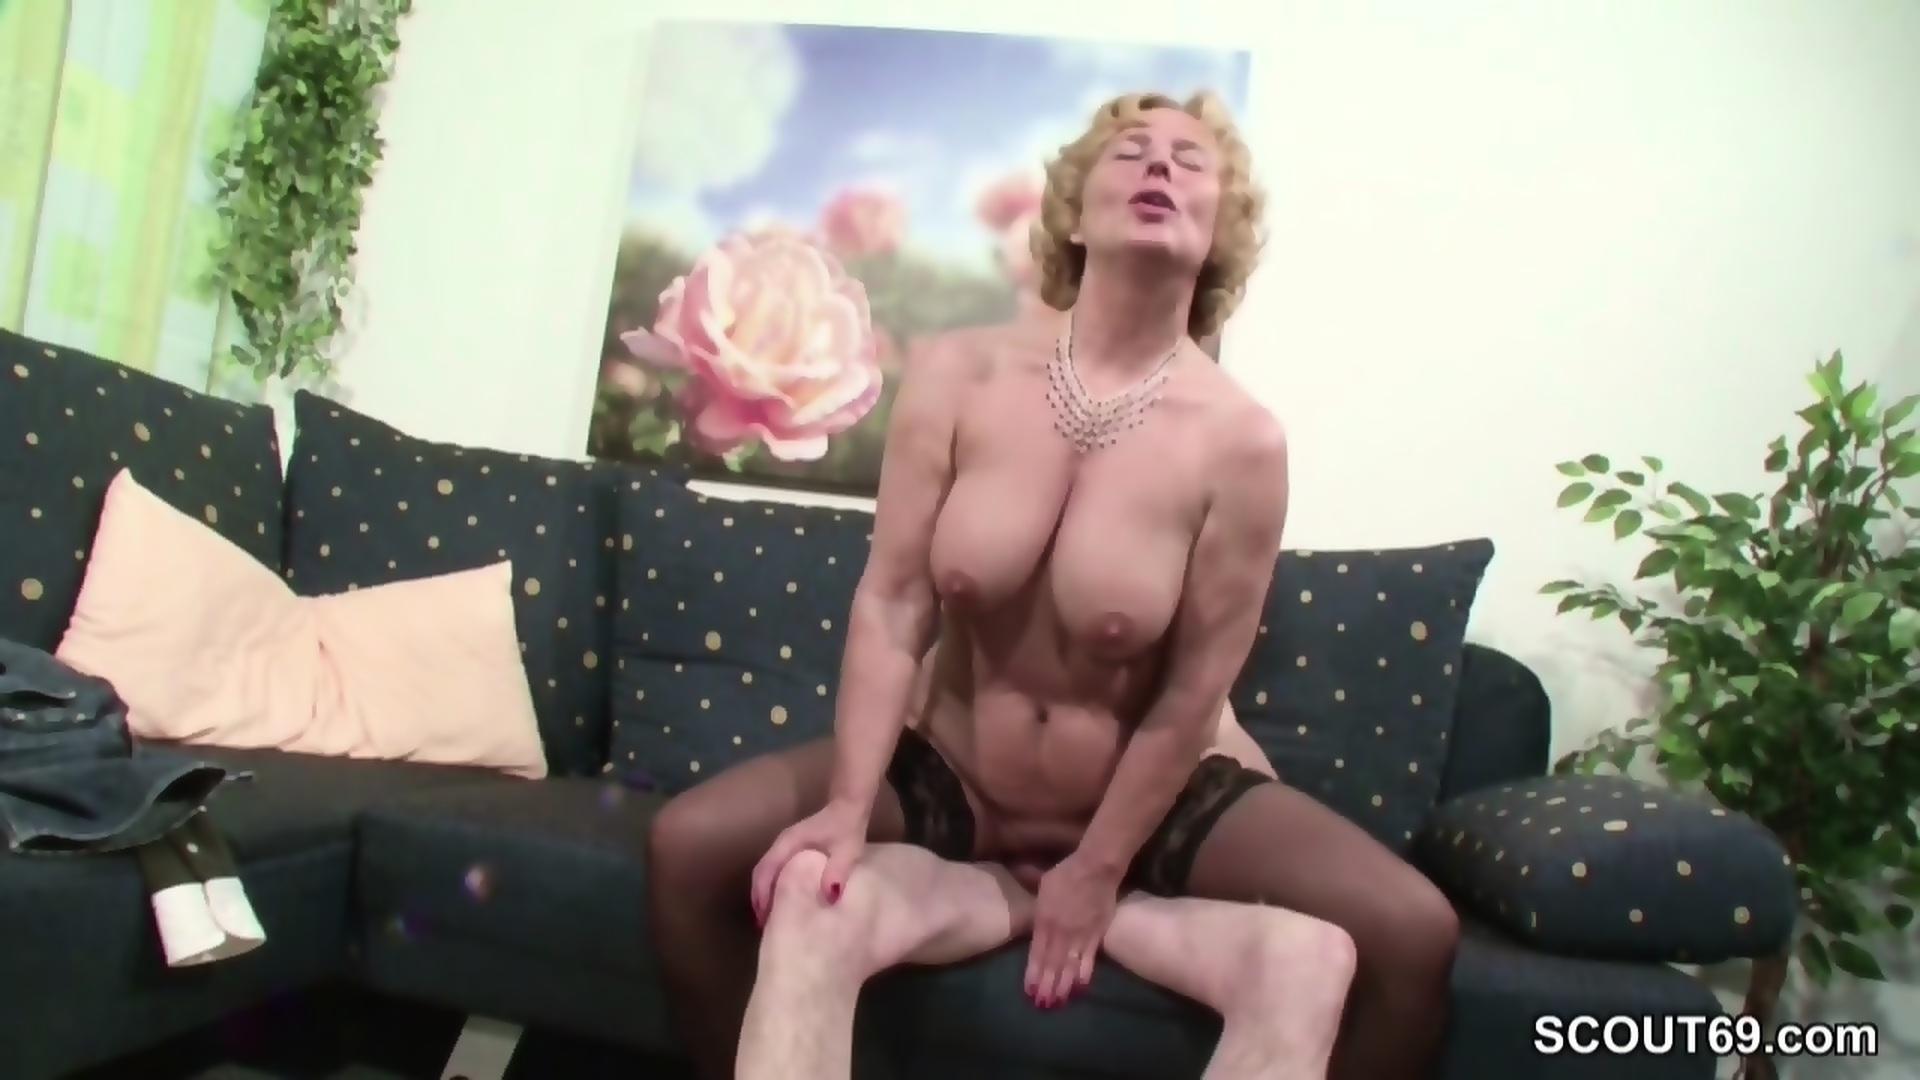 oma dojrzałe porno duży koc